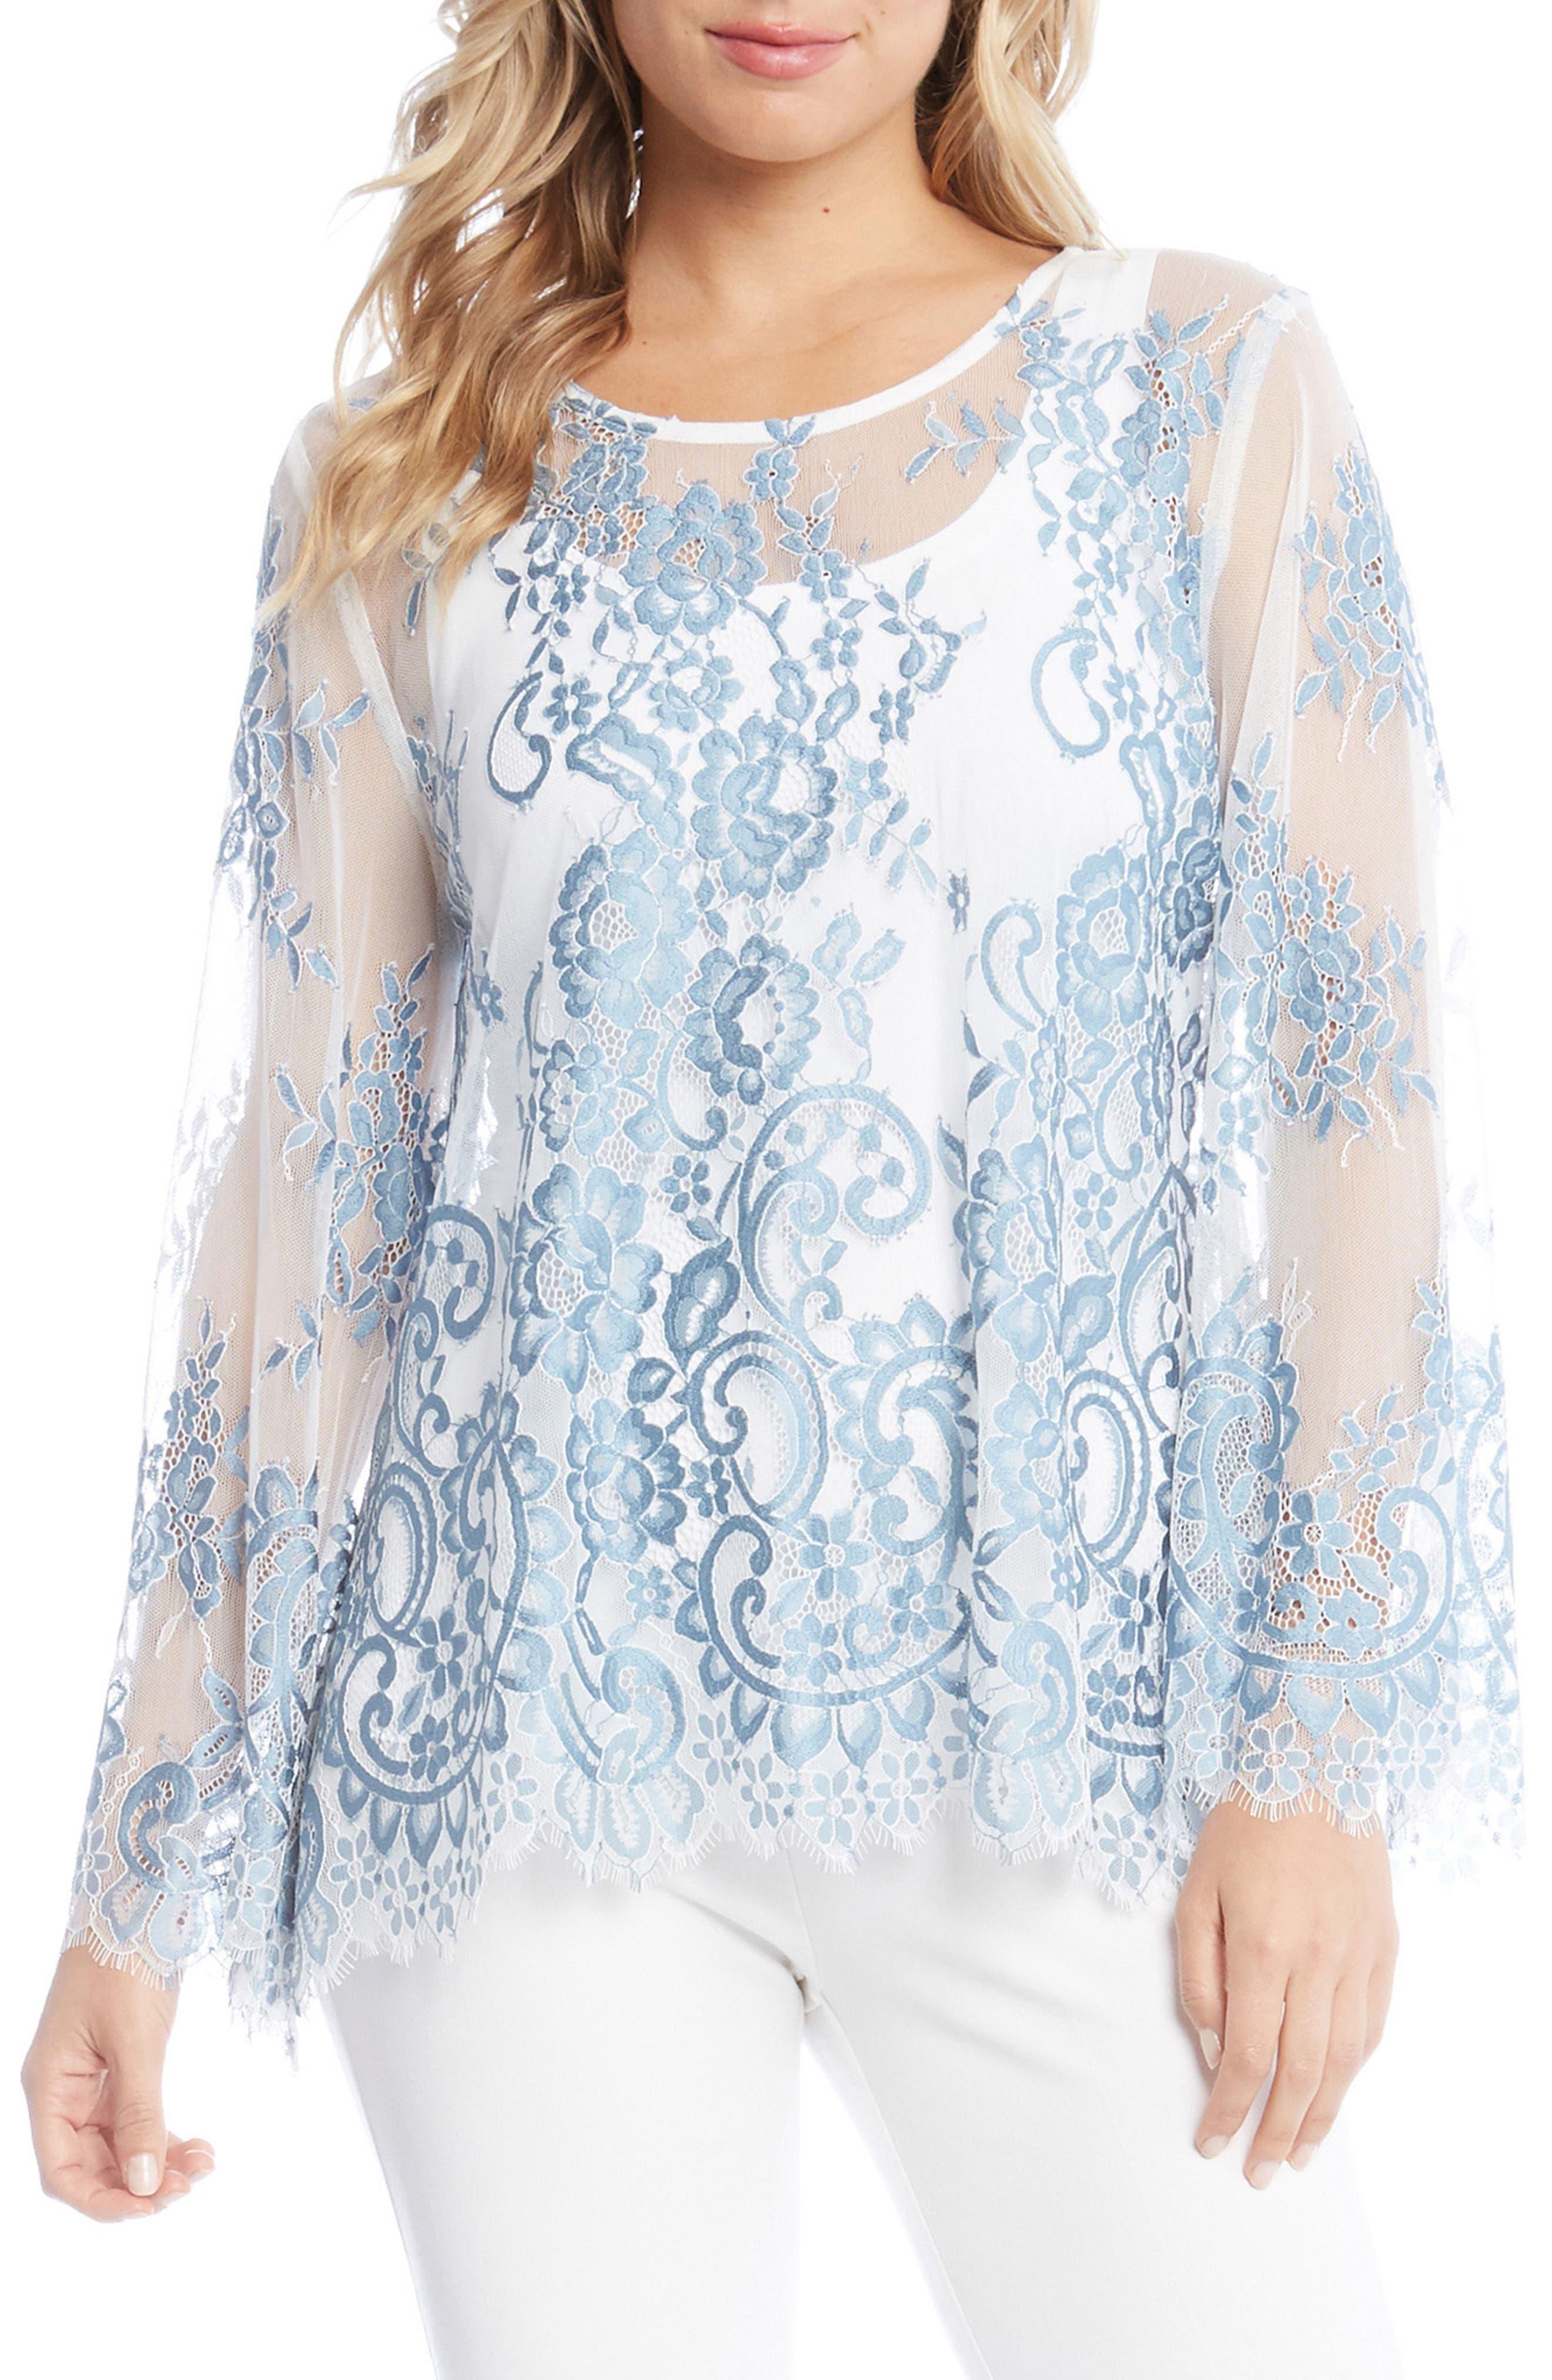 Alternate Image 1 Selected - Karen Kane Embroidered Floral Lace Top